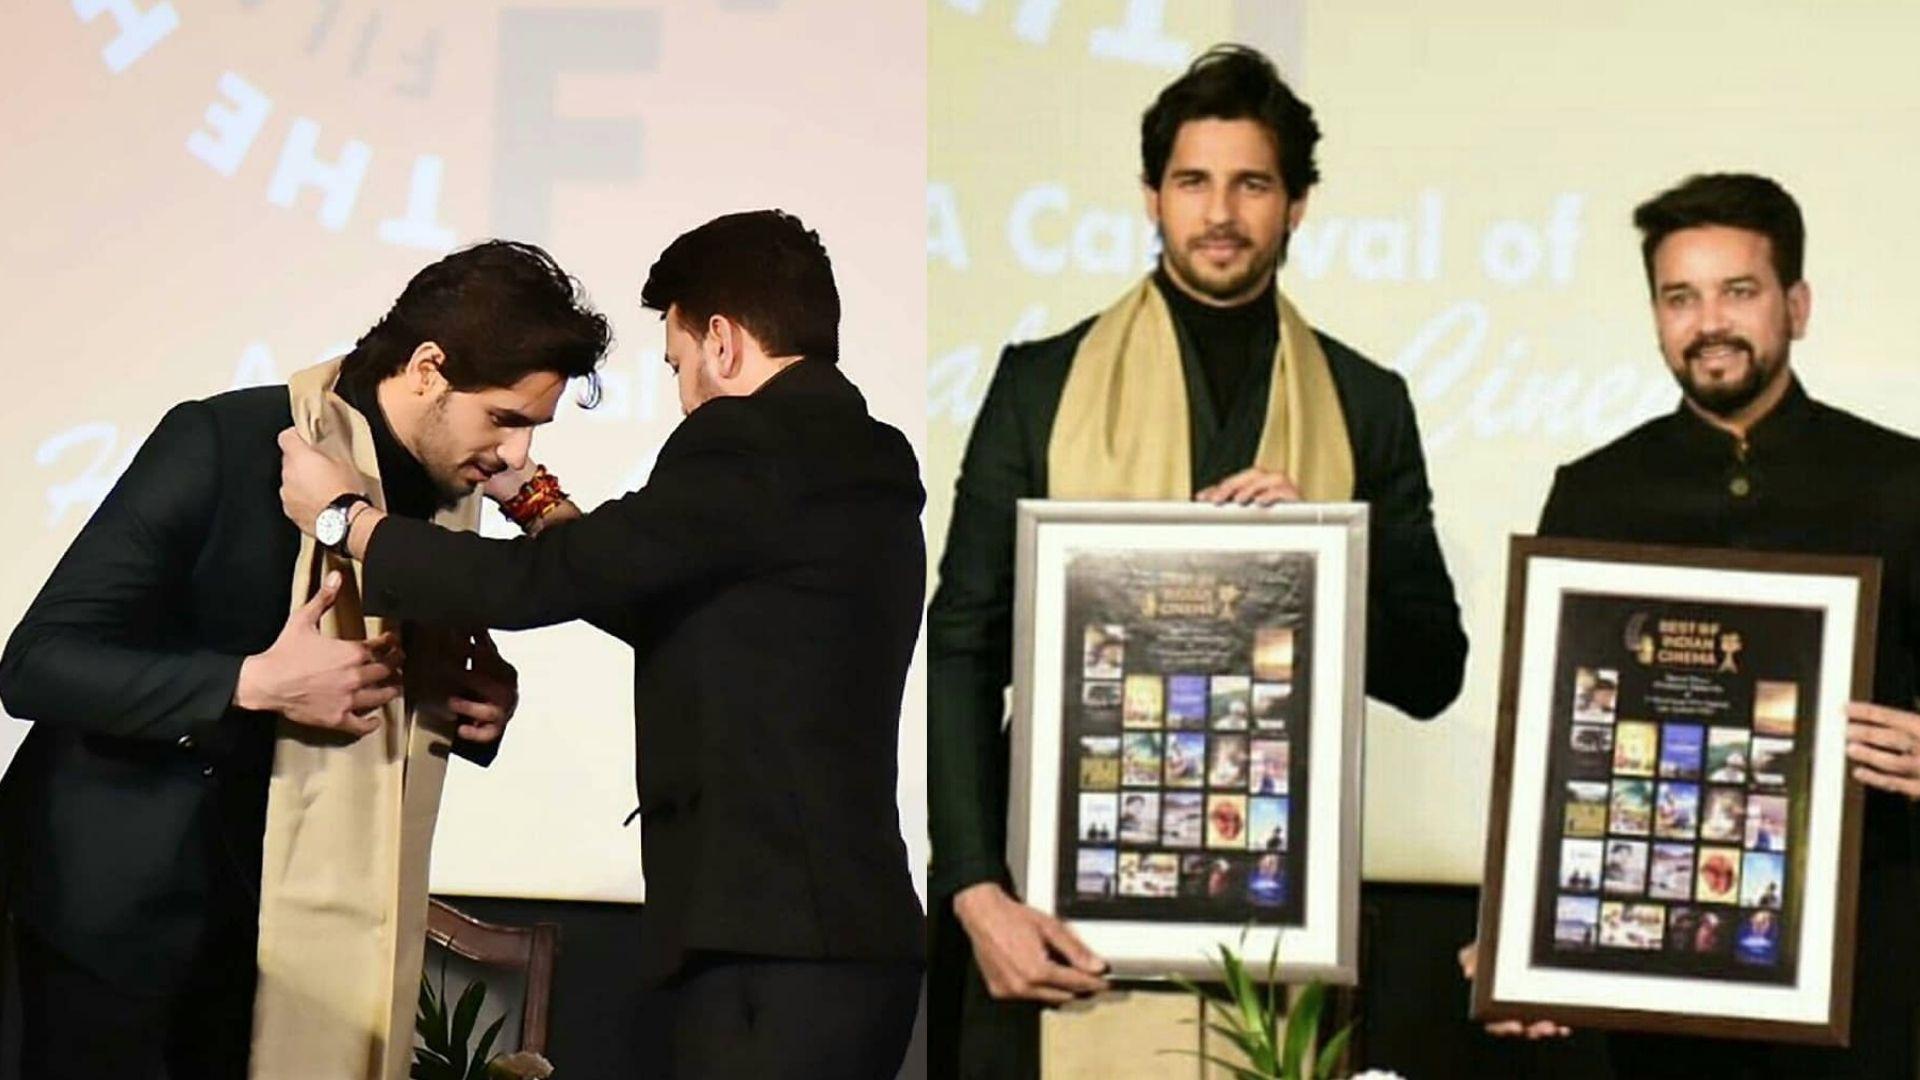 Sidharth Malhotra Inaugurates First Himalayan Film Festival With His Last Release; Co-star Kiara Advani Feels Proud